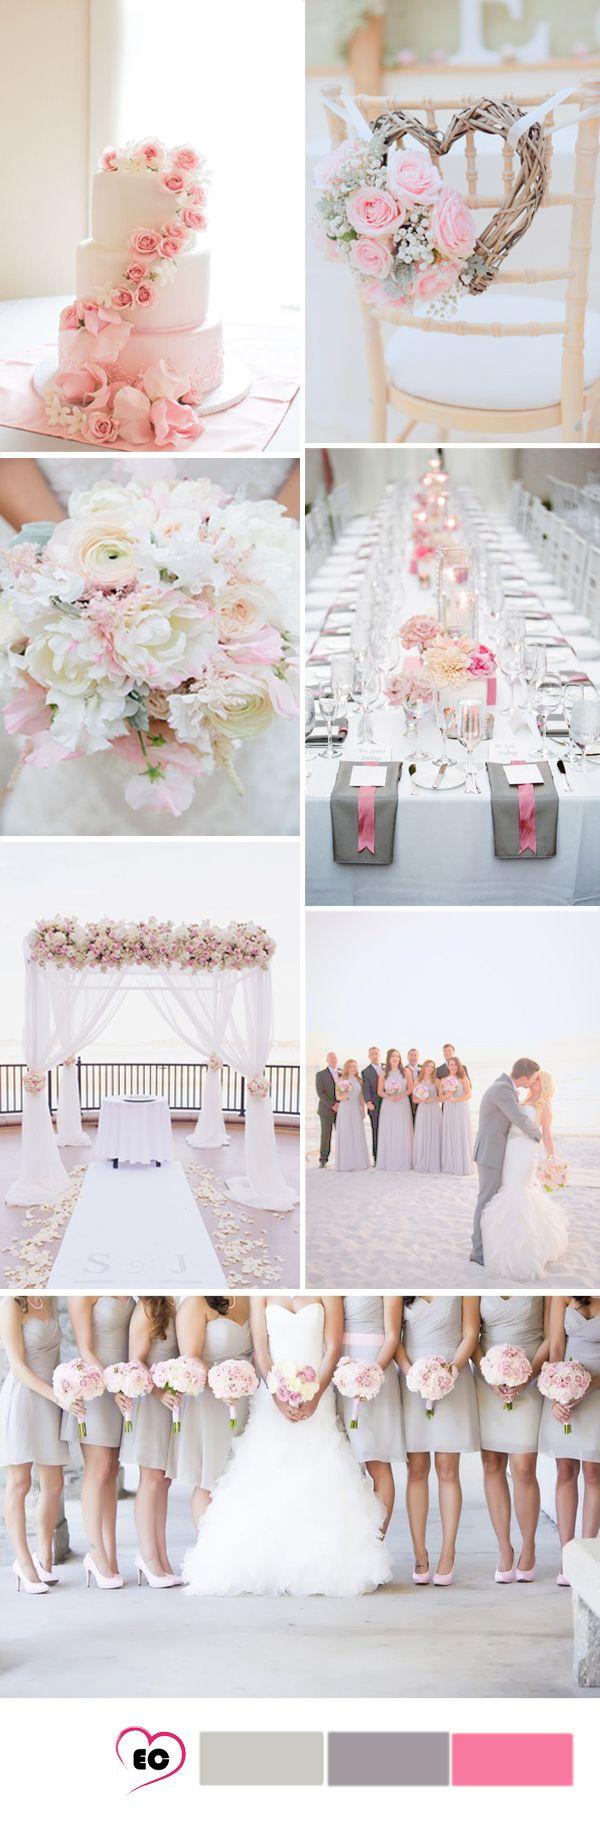 7 Grey Color Palette Wedding Ideas & Inspirations | Blush pink ...